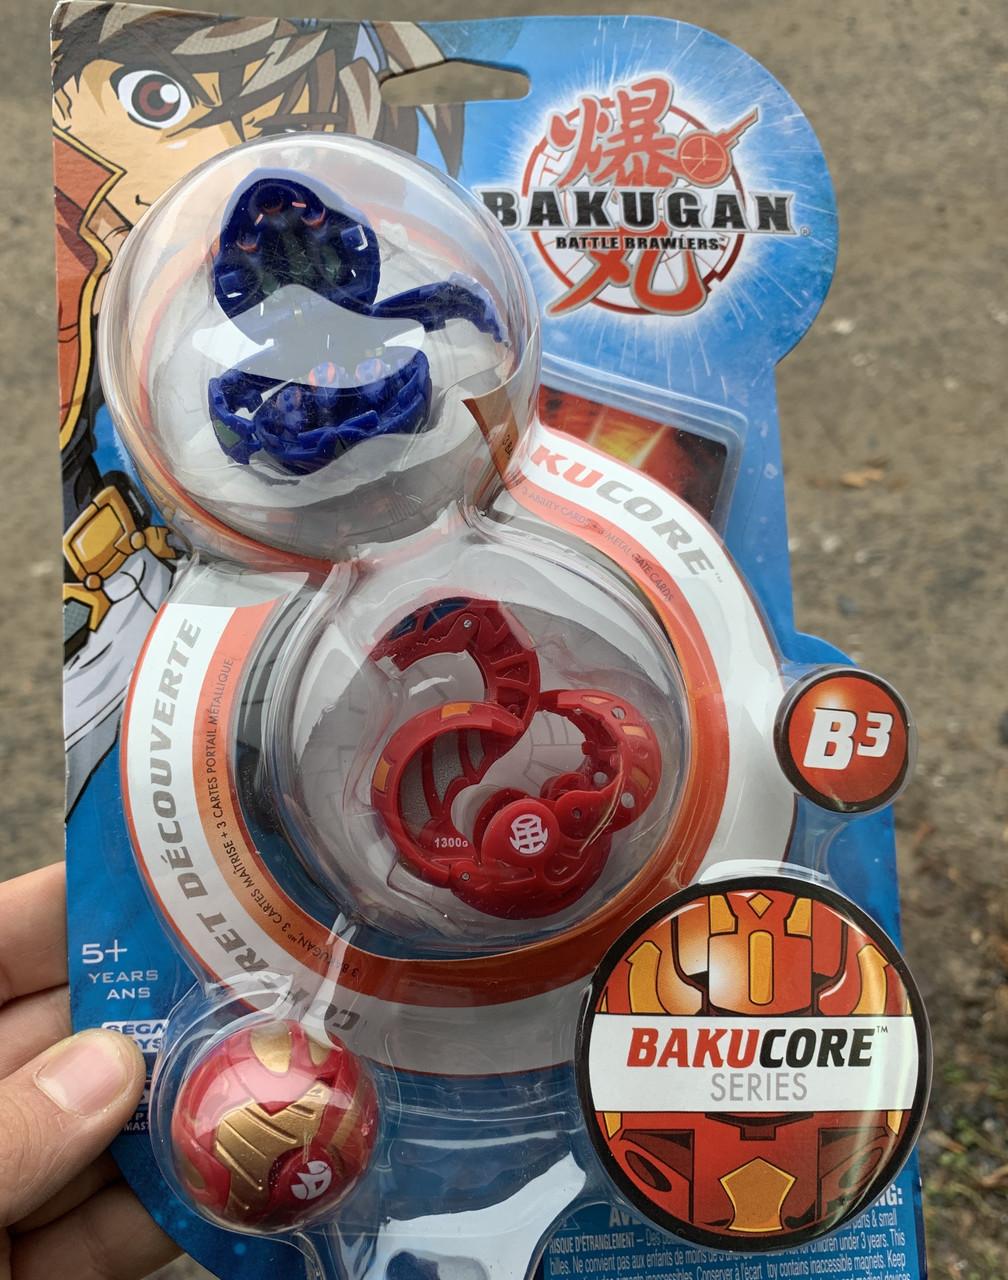 Набор Бакуган Bakugan из 3 штук